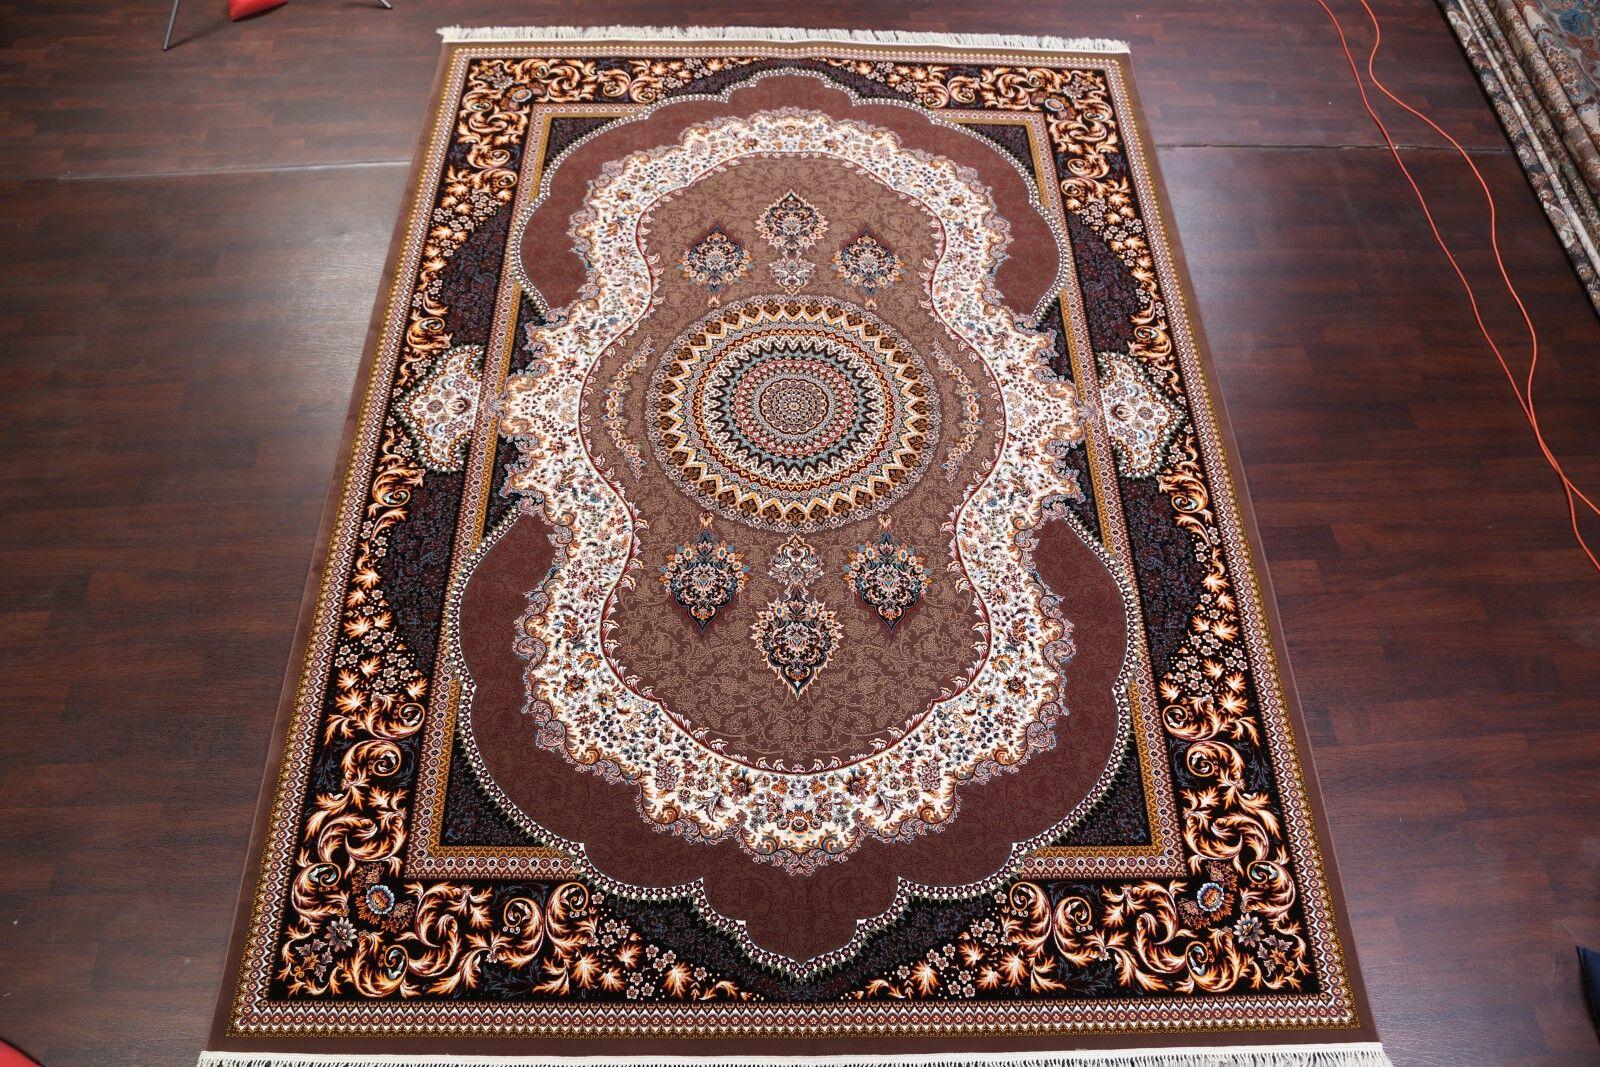 Geometric Soft Plush Classical Tabriz Persian Navy Blue/Brown/Beige Area Rug